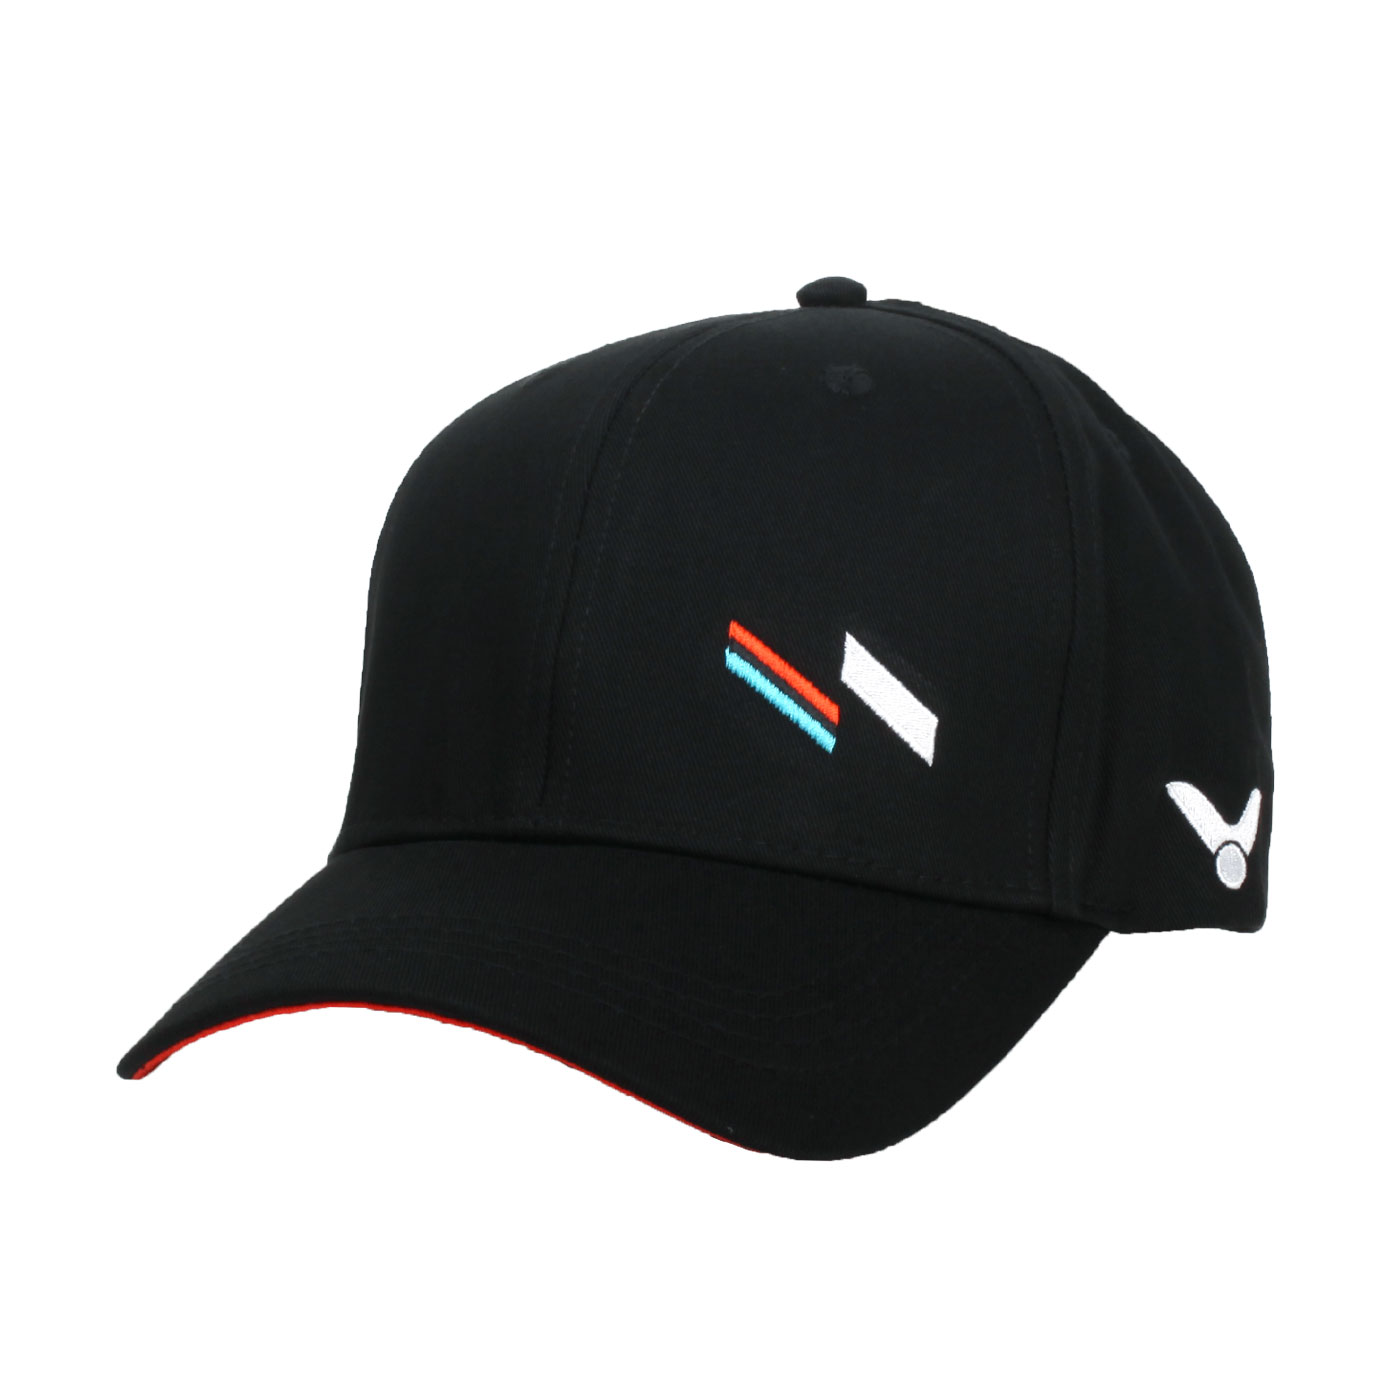 VICTOR 運動帽 C-VC211